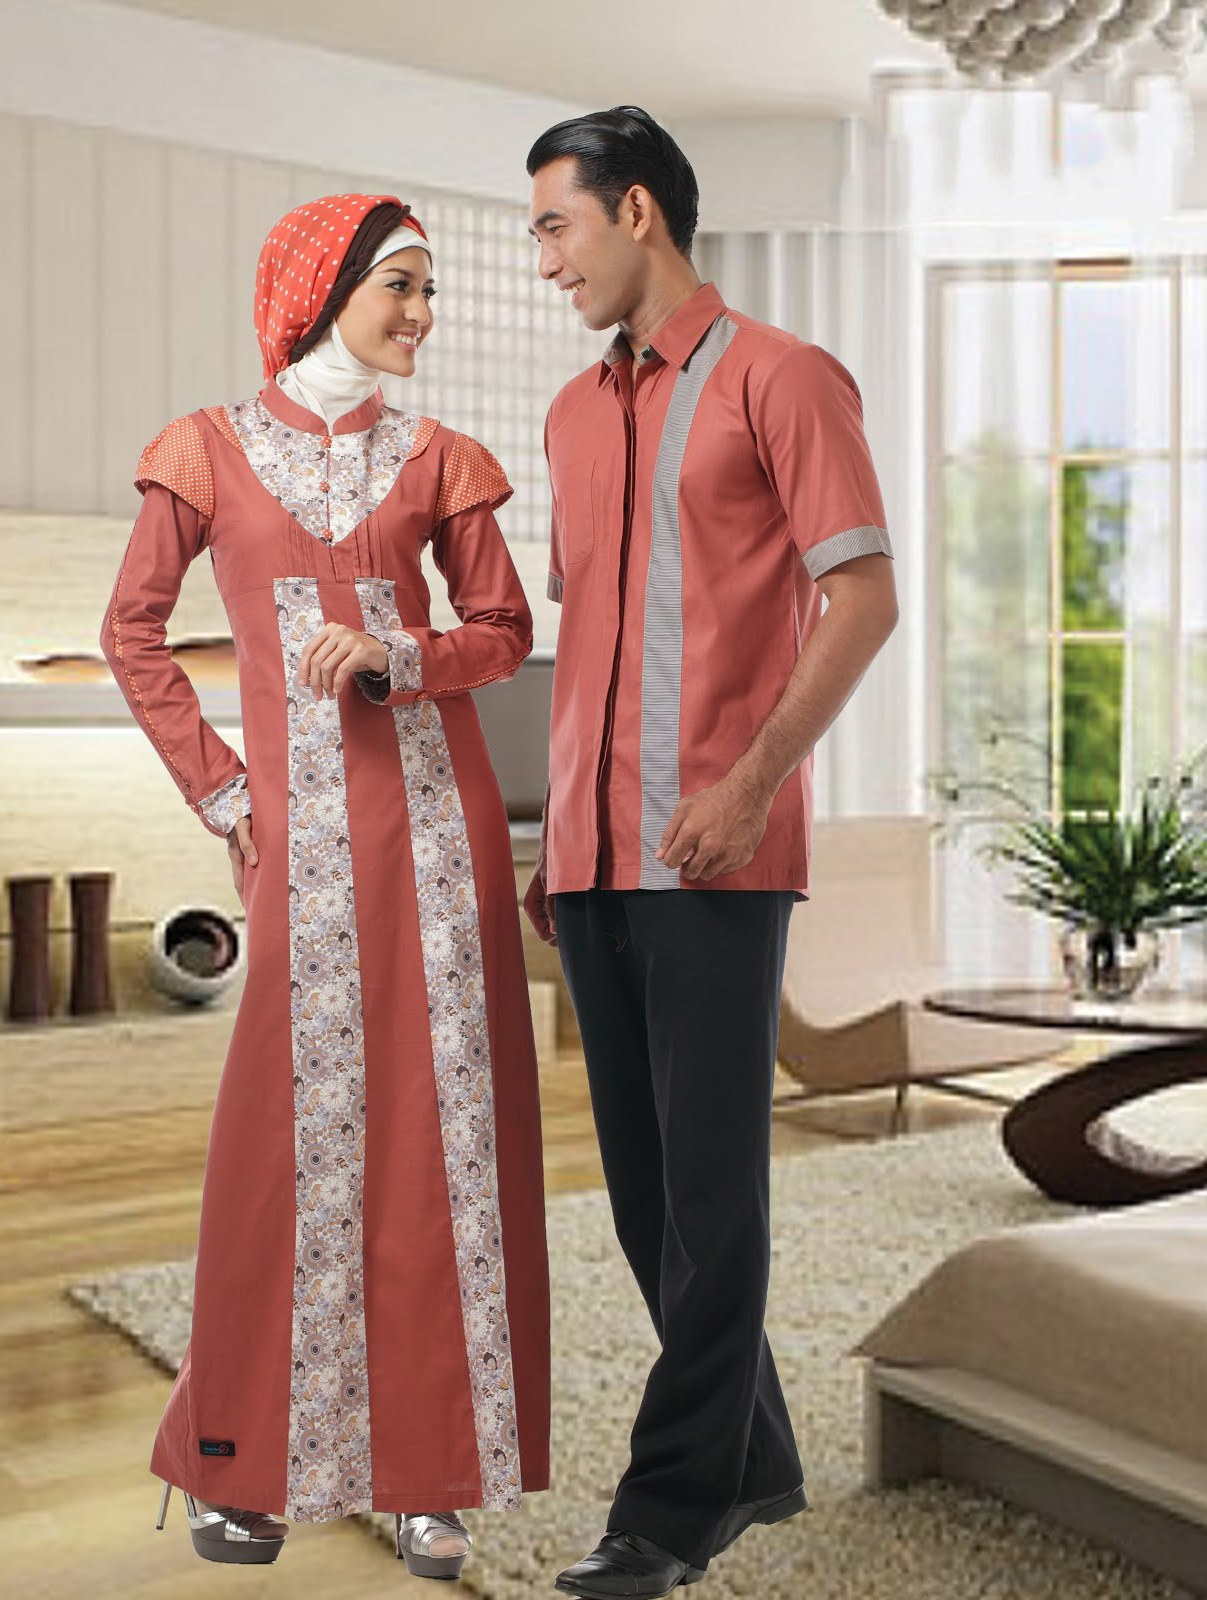 Inspirasi Baju Lebaran Batik S1du Trend Model Baju Batik Lebaran Terbaru 2013